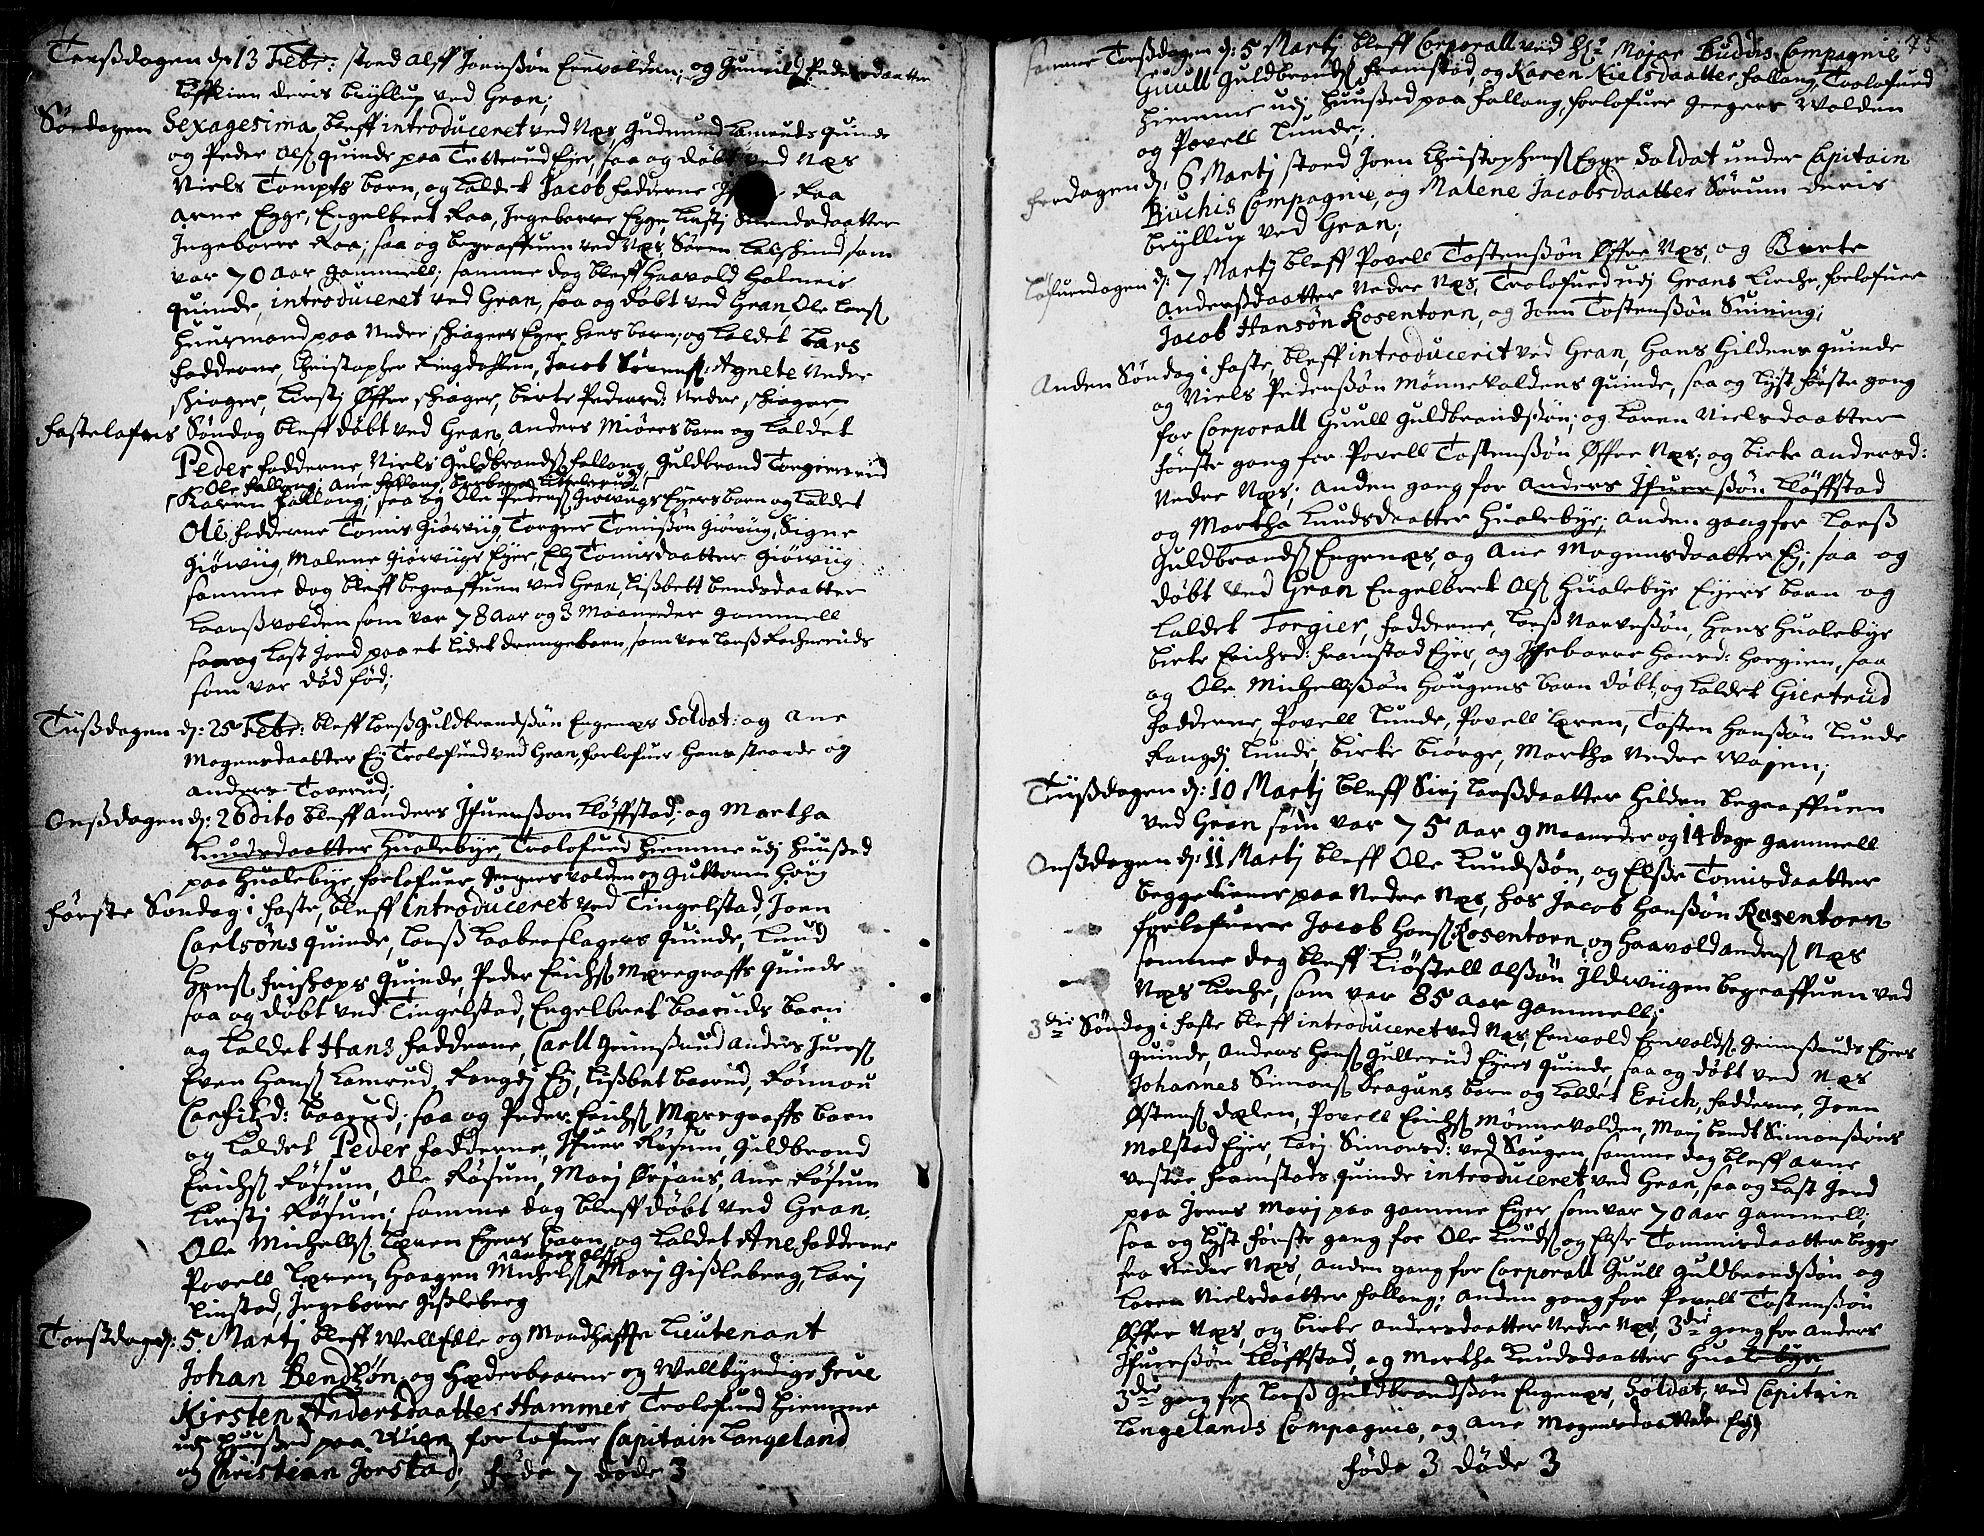 SAH, Gran prestekontor, Ministerialbok nr. 1, 1707-1731, s. 75